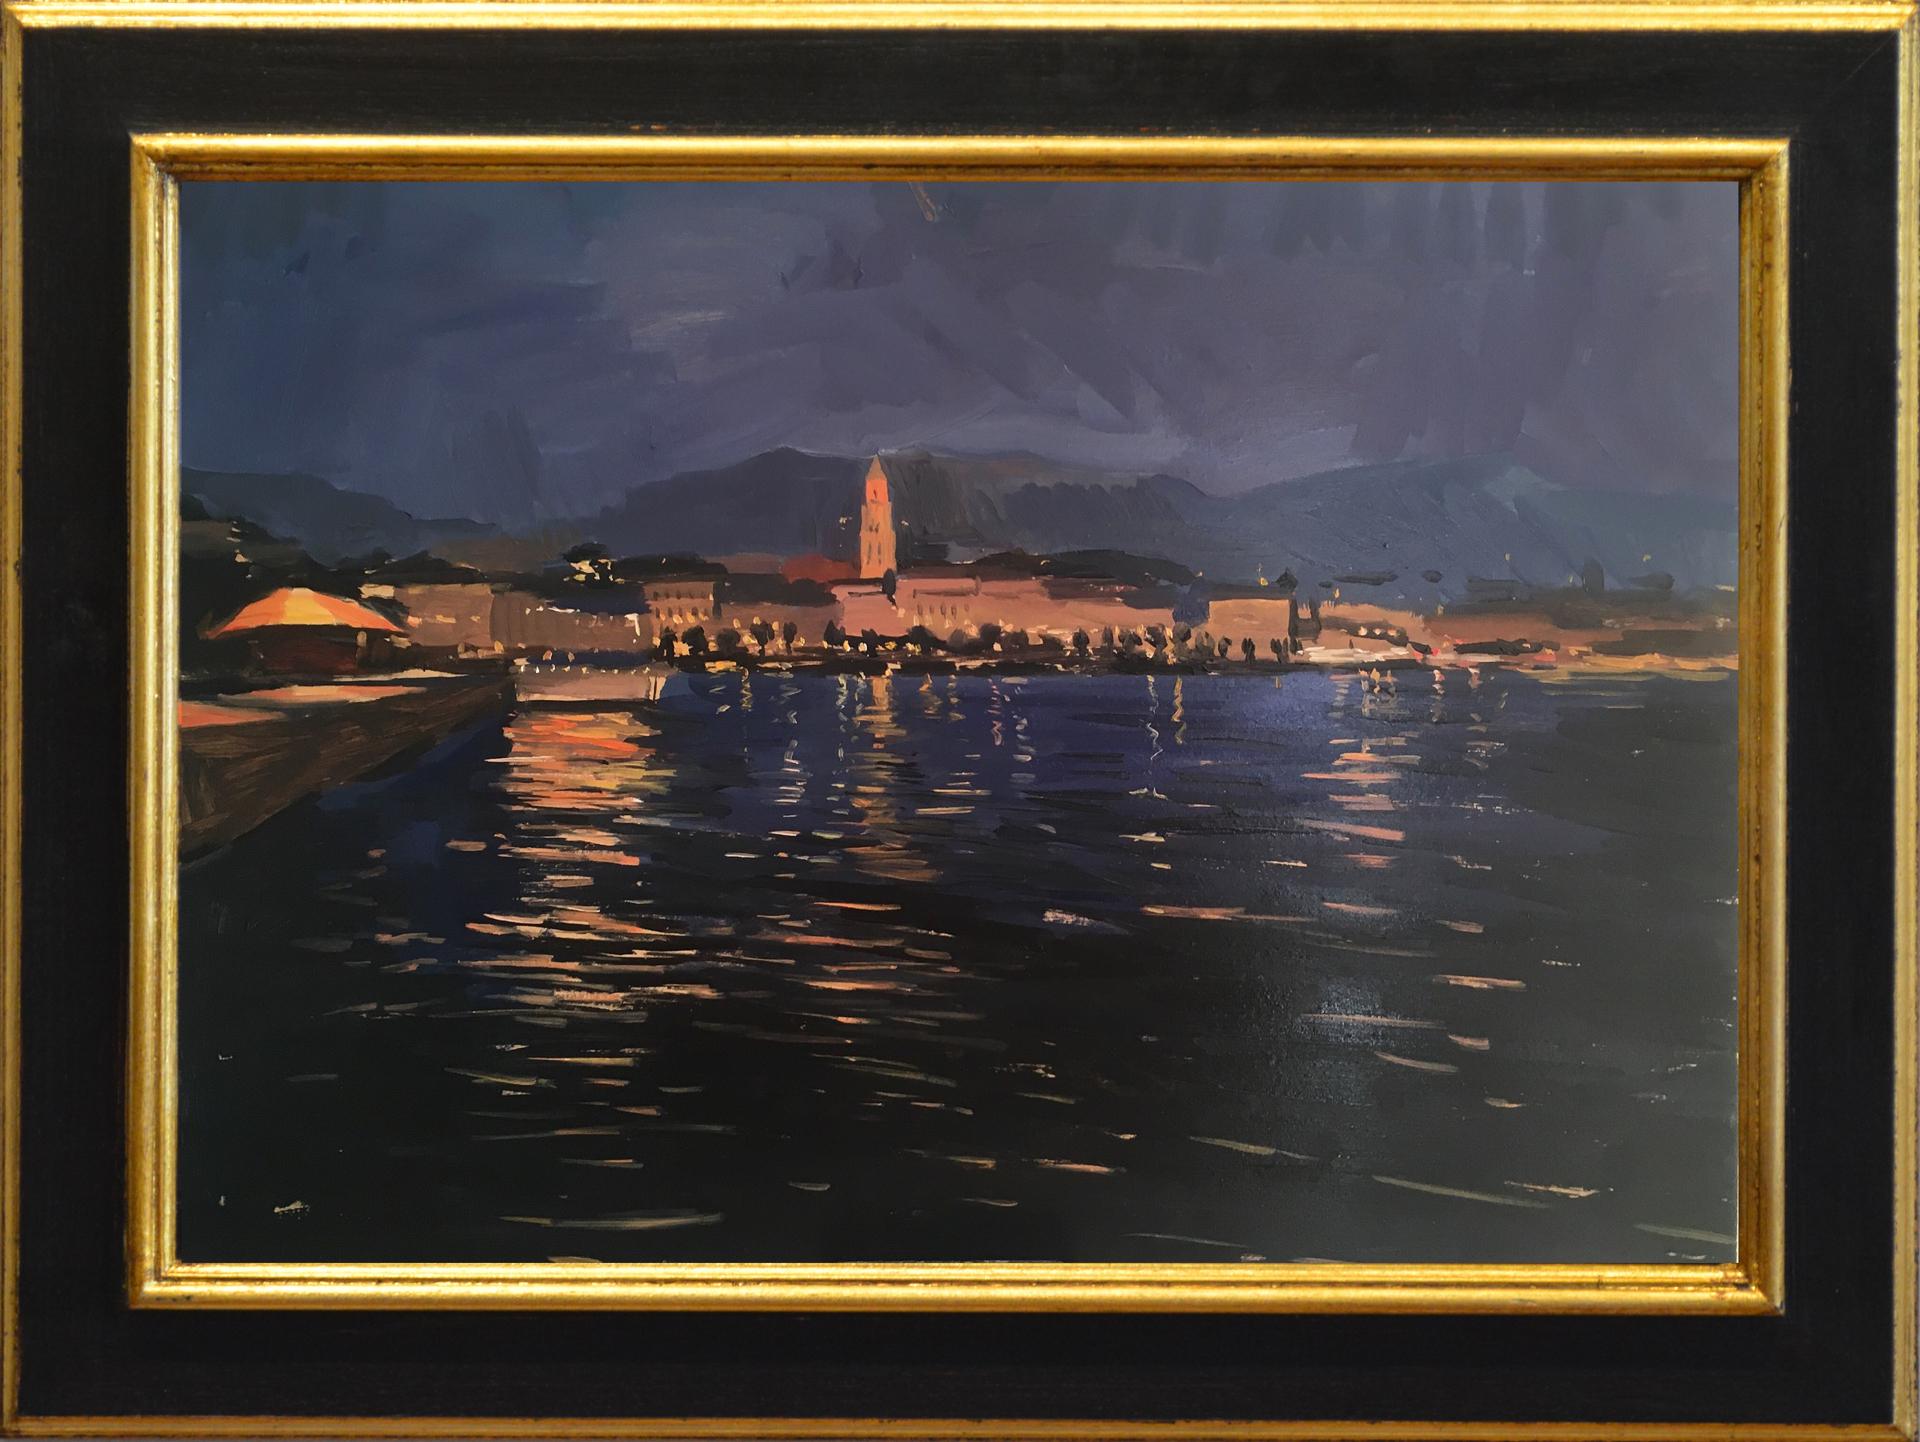 Evening in Croatia by Tanvi Pathare